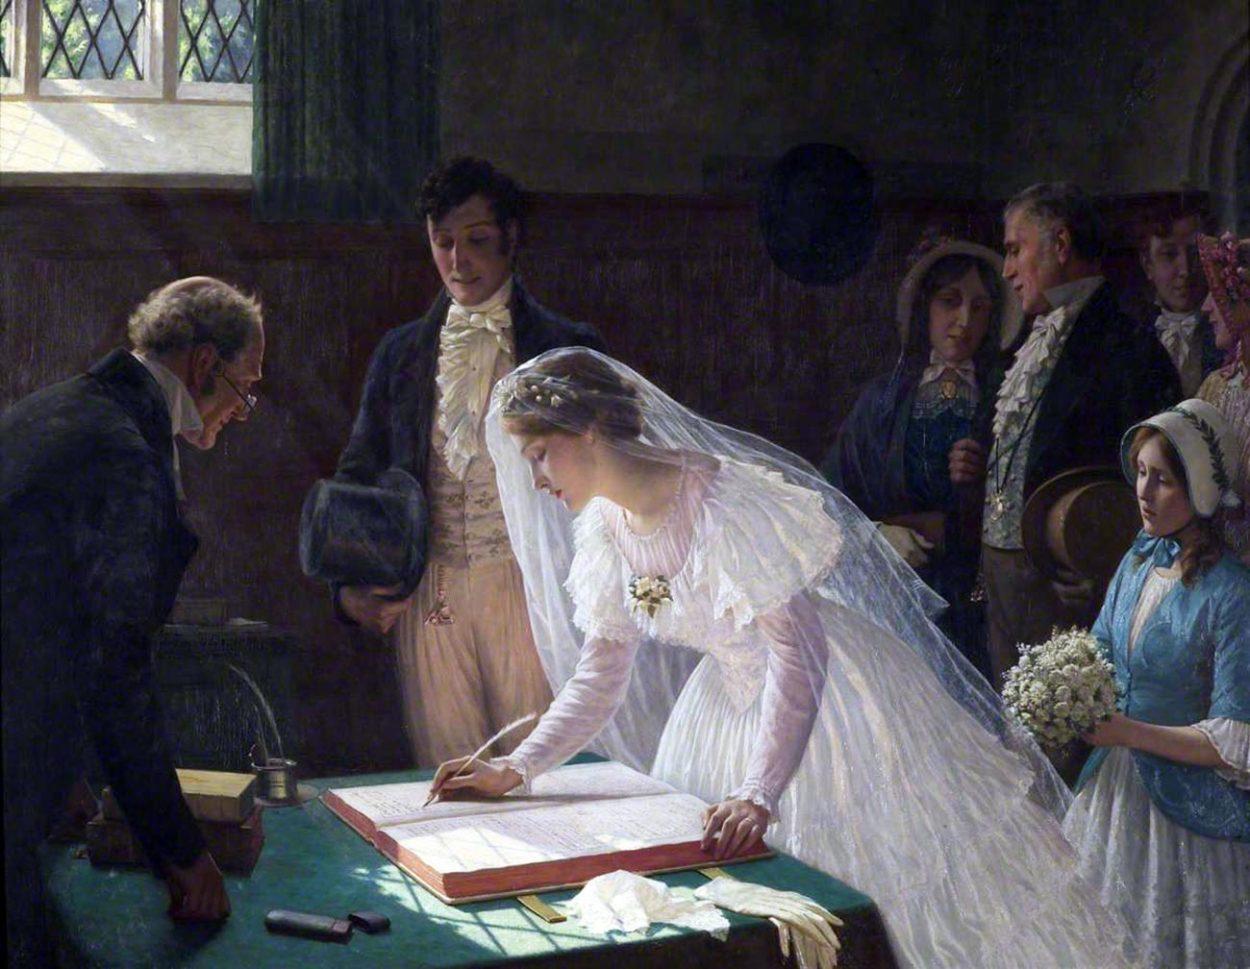 Картина Э. Лейтона «Регистрация брака».